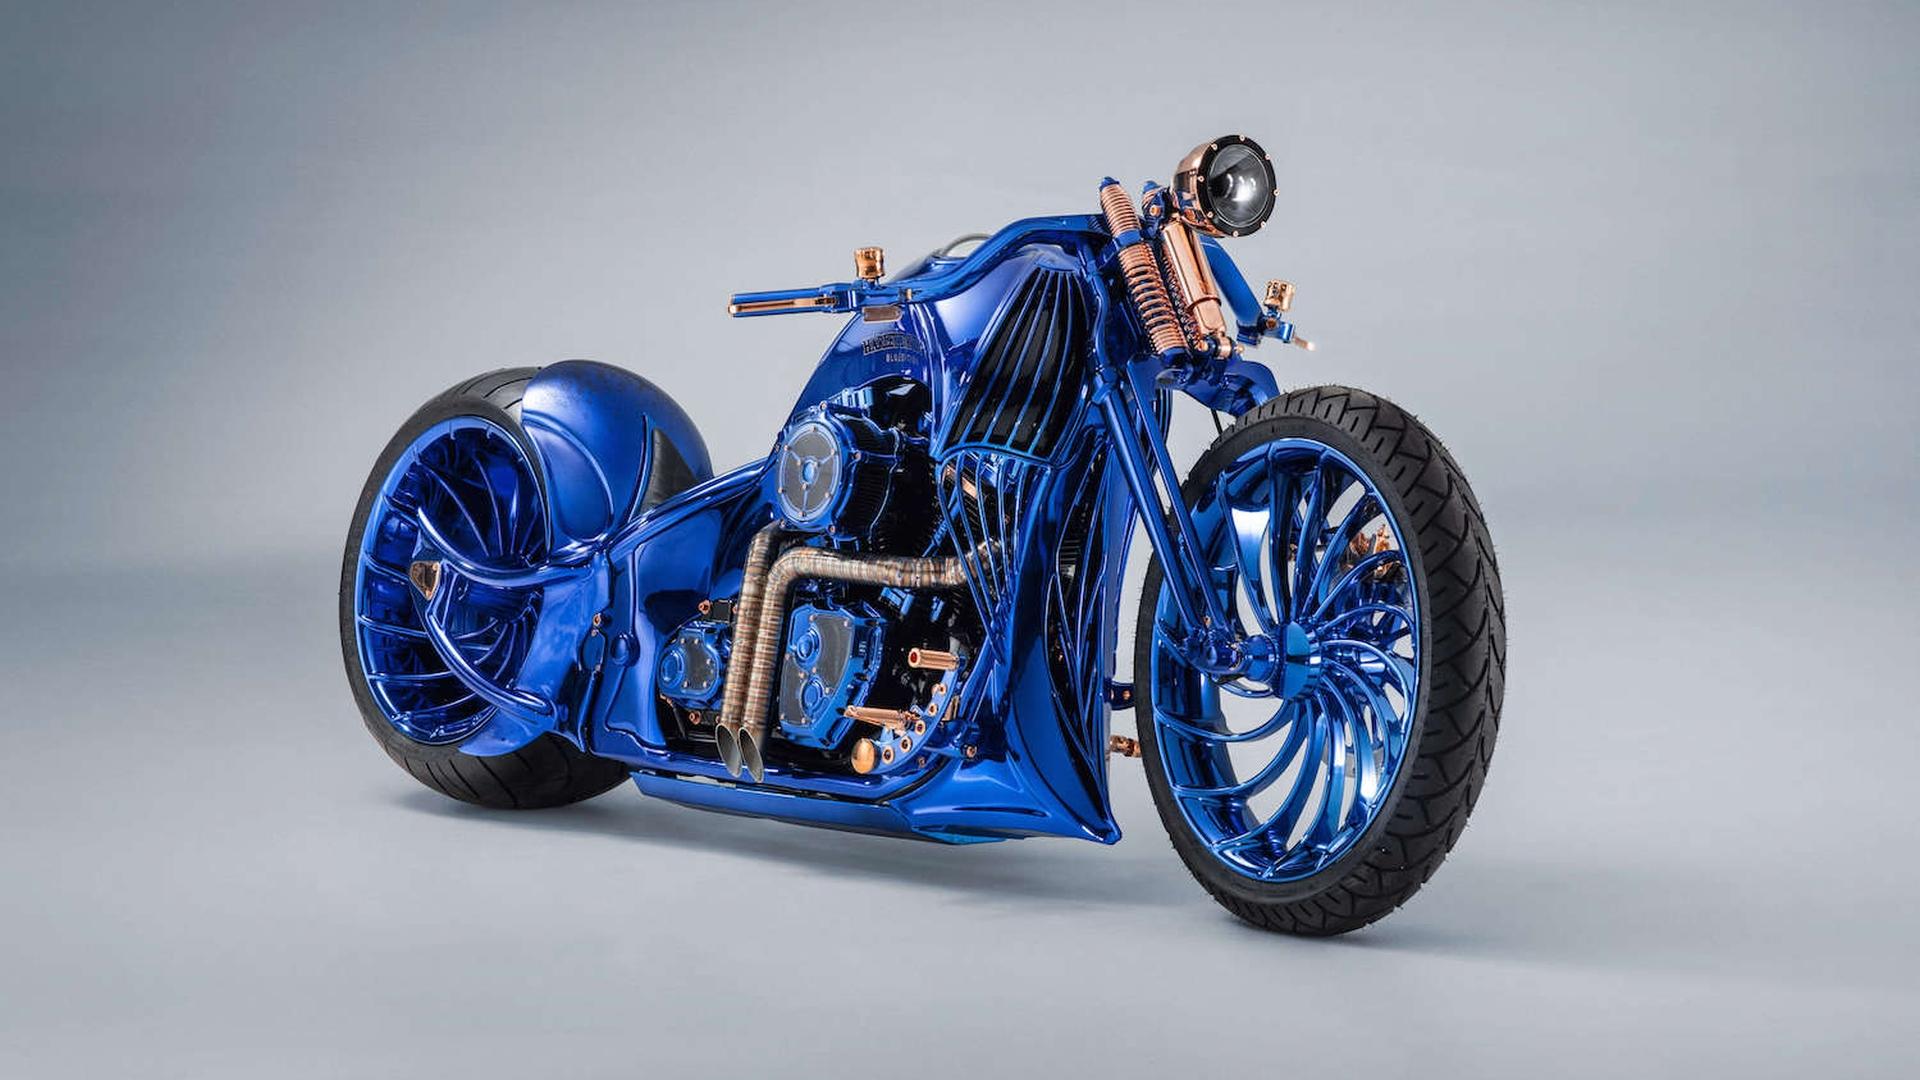 bucherer-harley-davidson-blue-edition-08.jpg